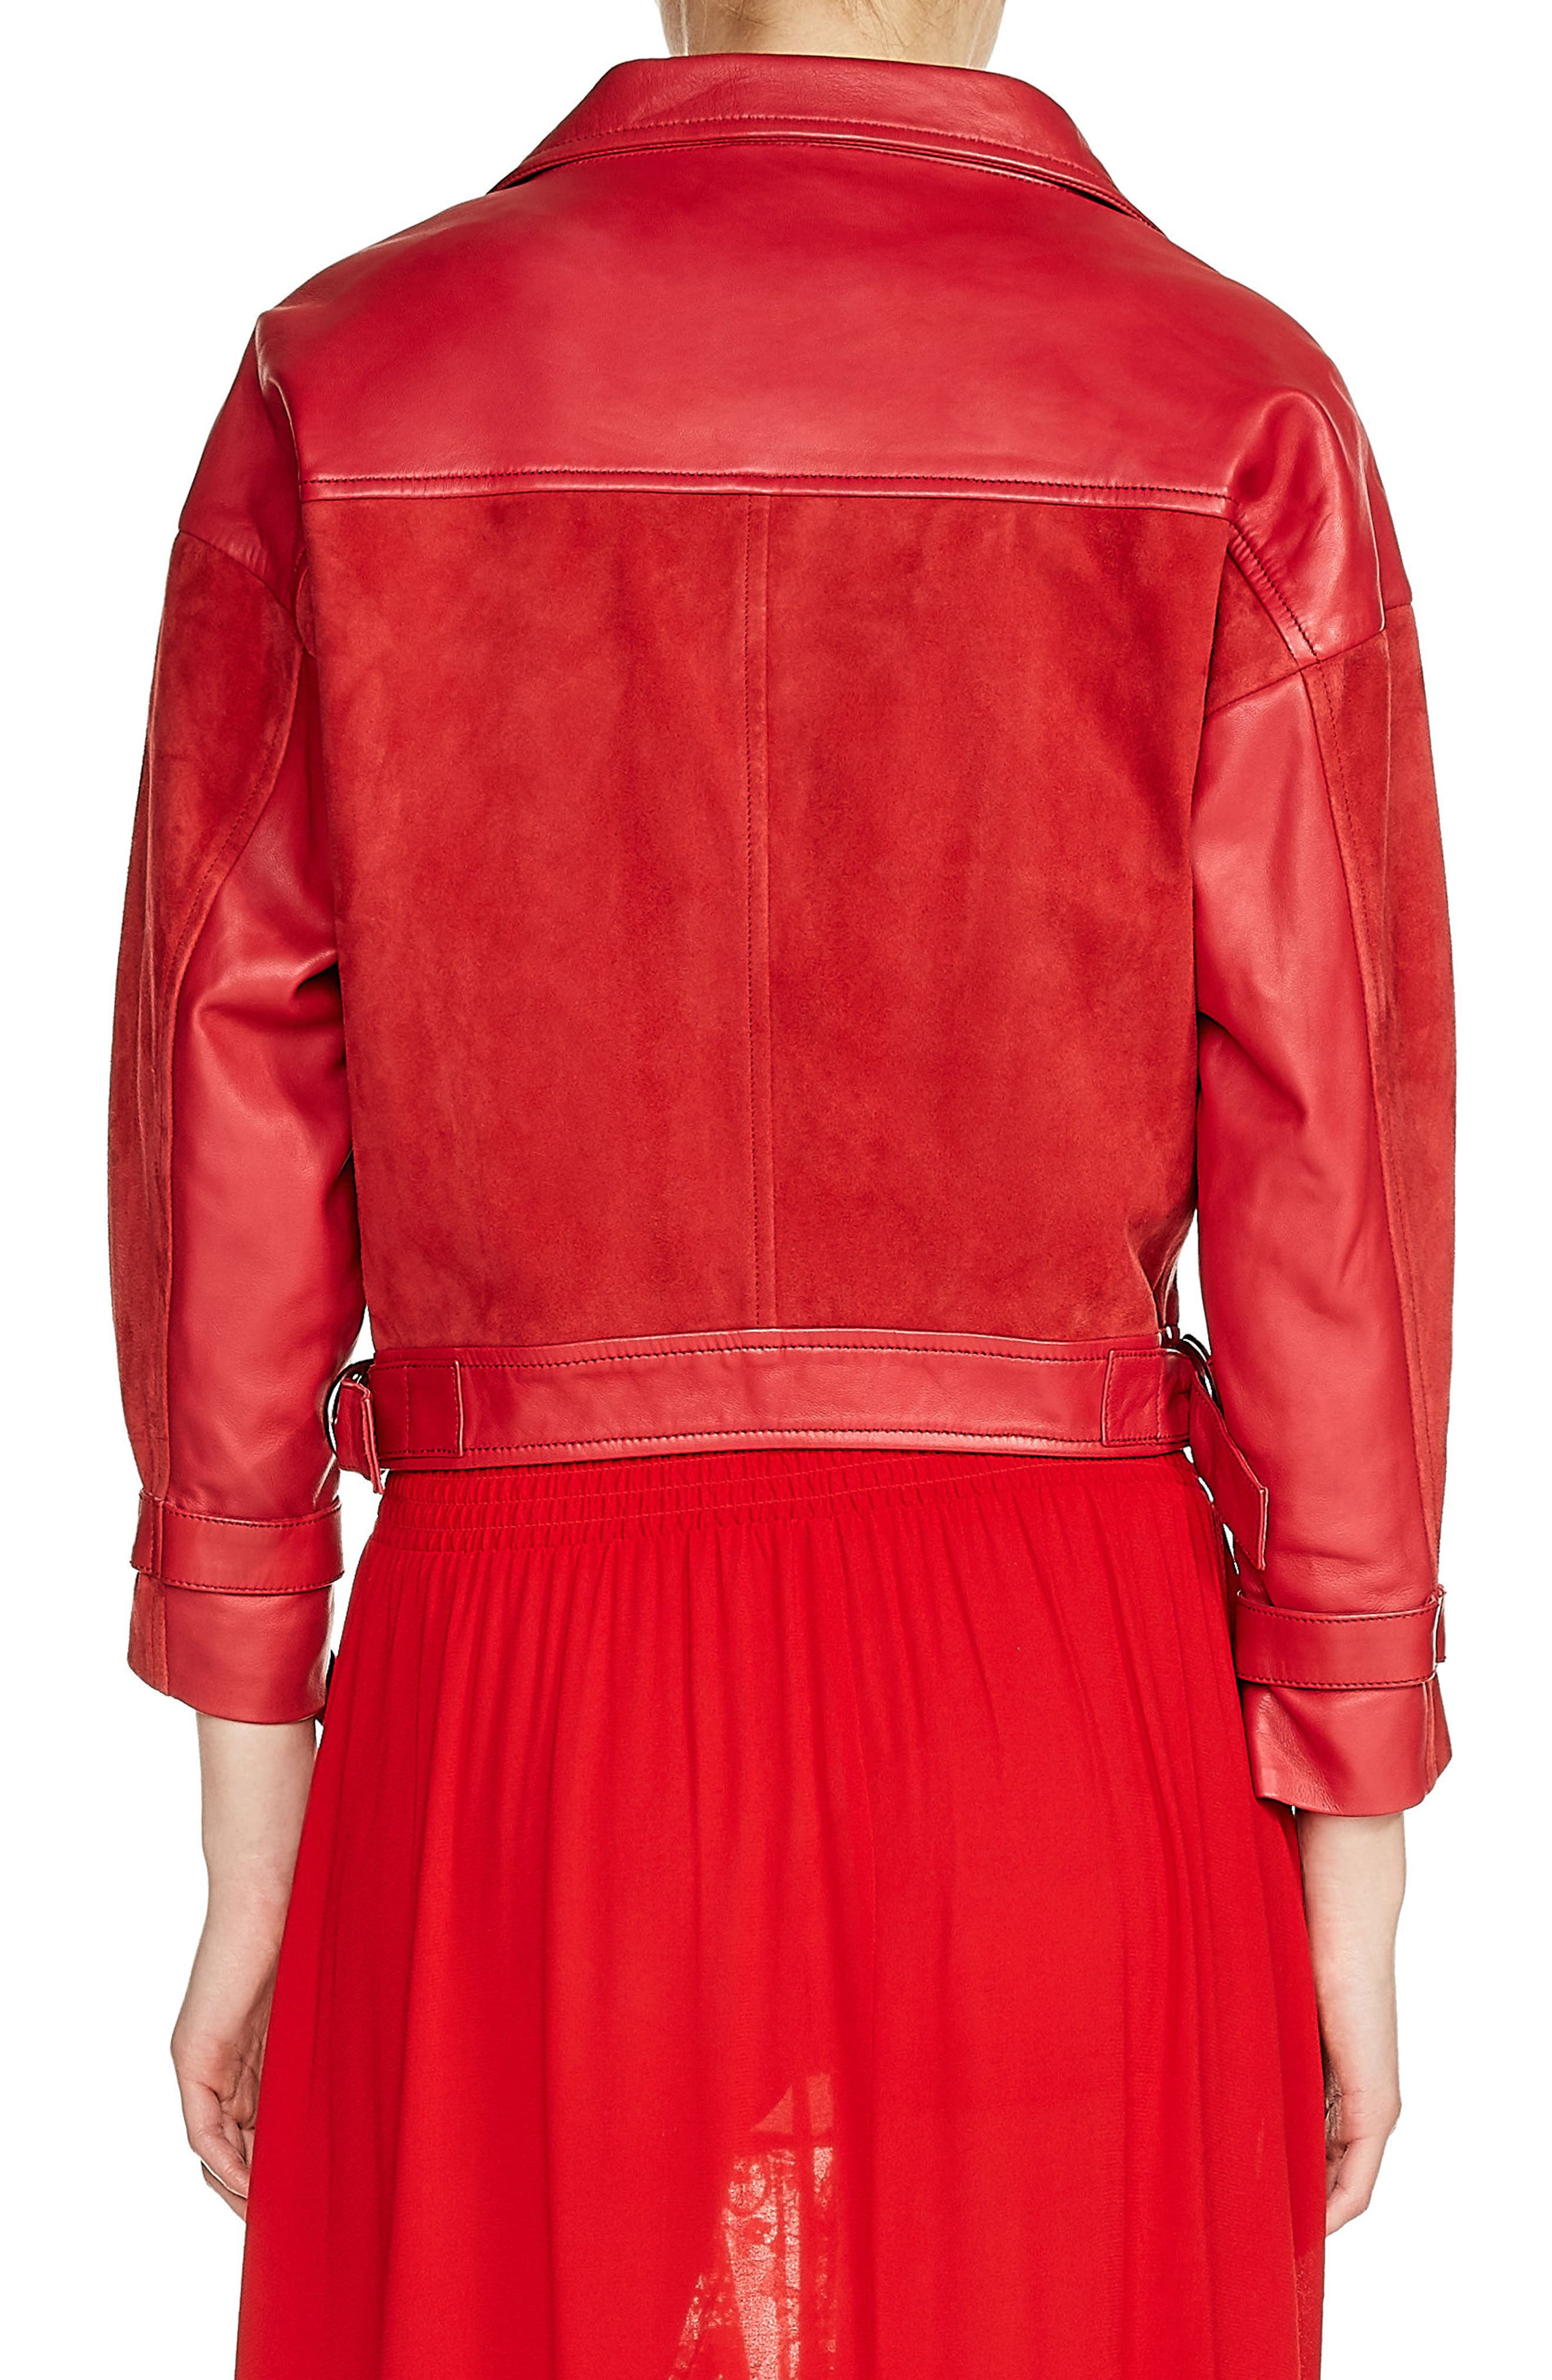 Belt Detail Leather & Suede Jacket,                             Alternate thumbnail 2, color,                             601